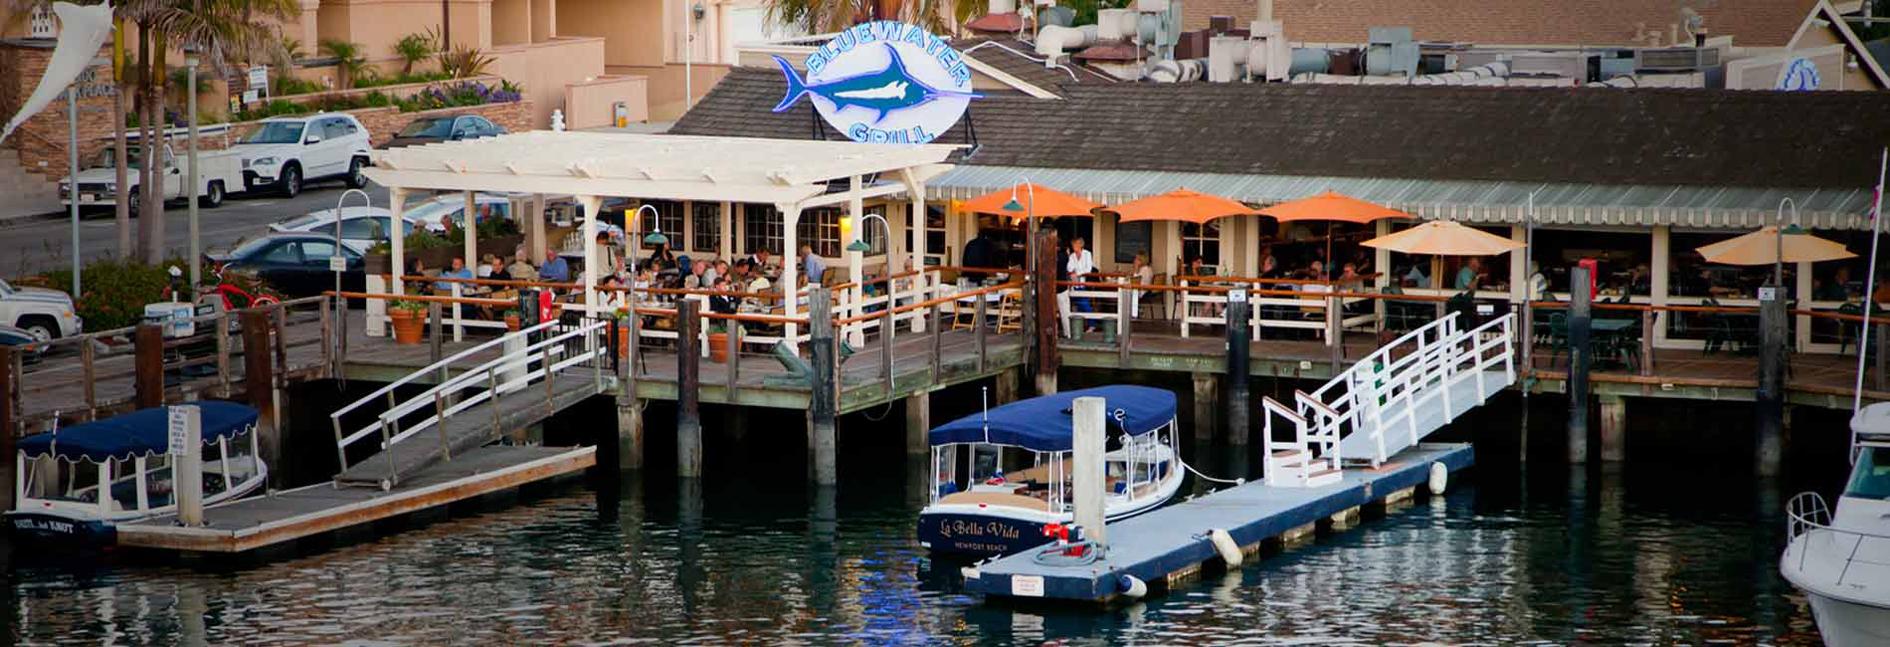 The Blue Water Grill Newport Beach